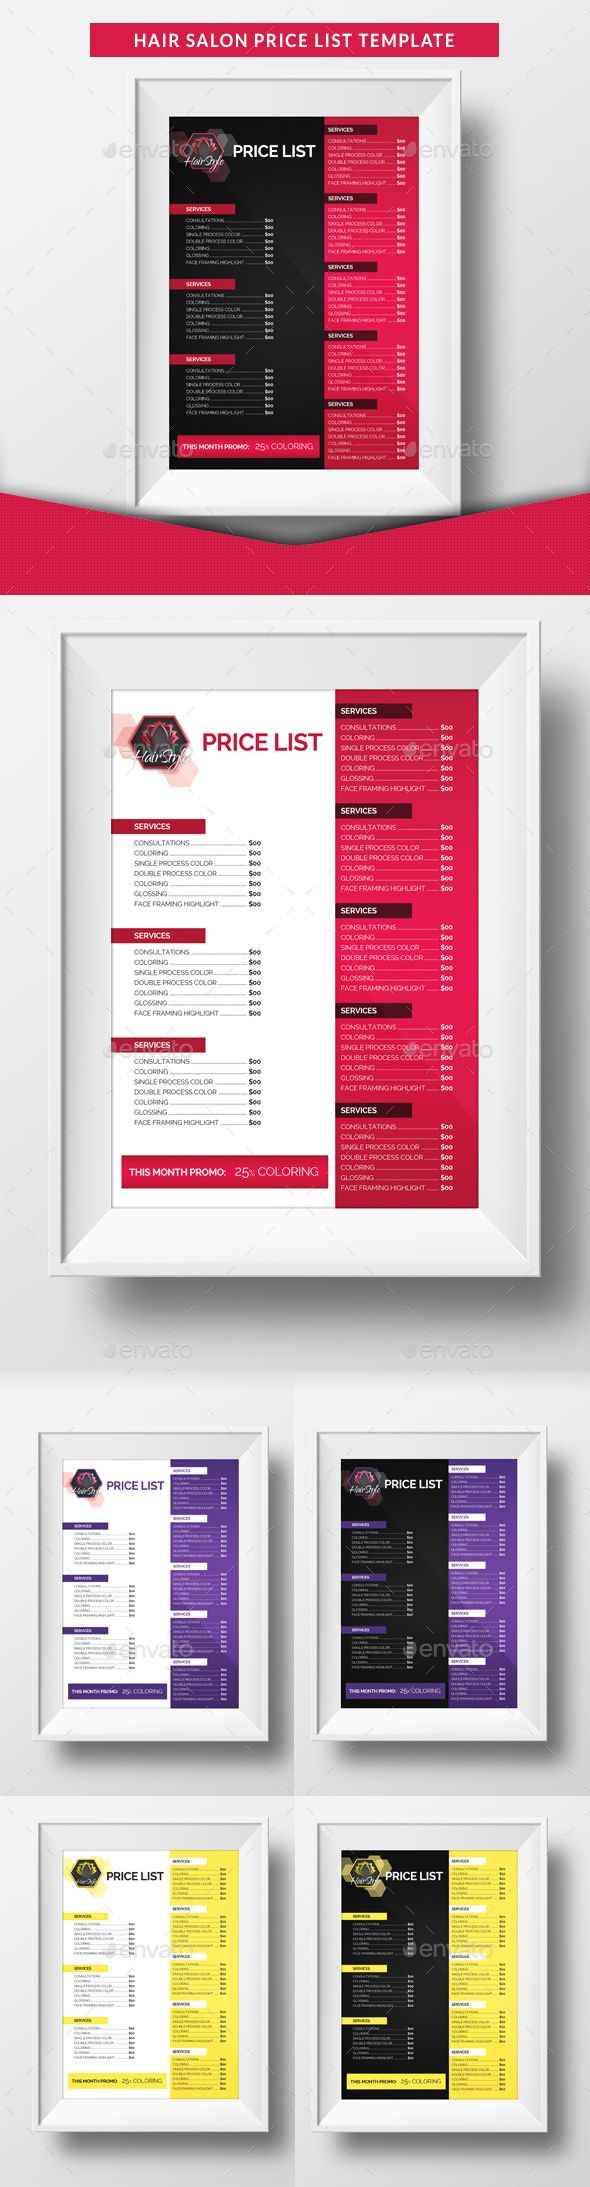 Free handyman price list - Hair Salon Price List Template